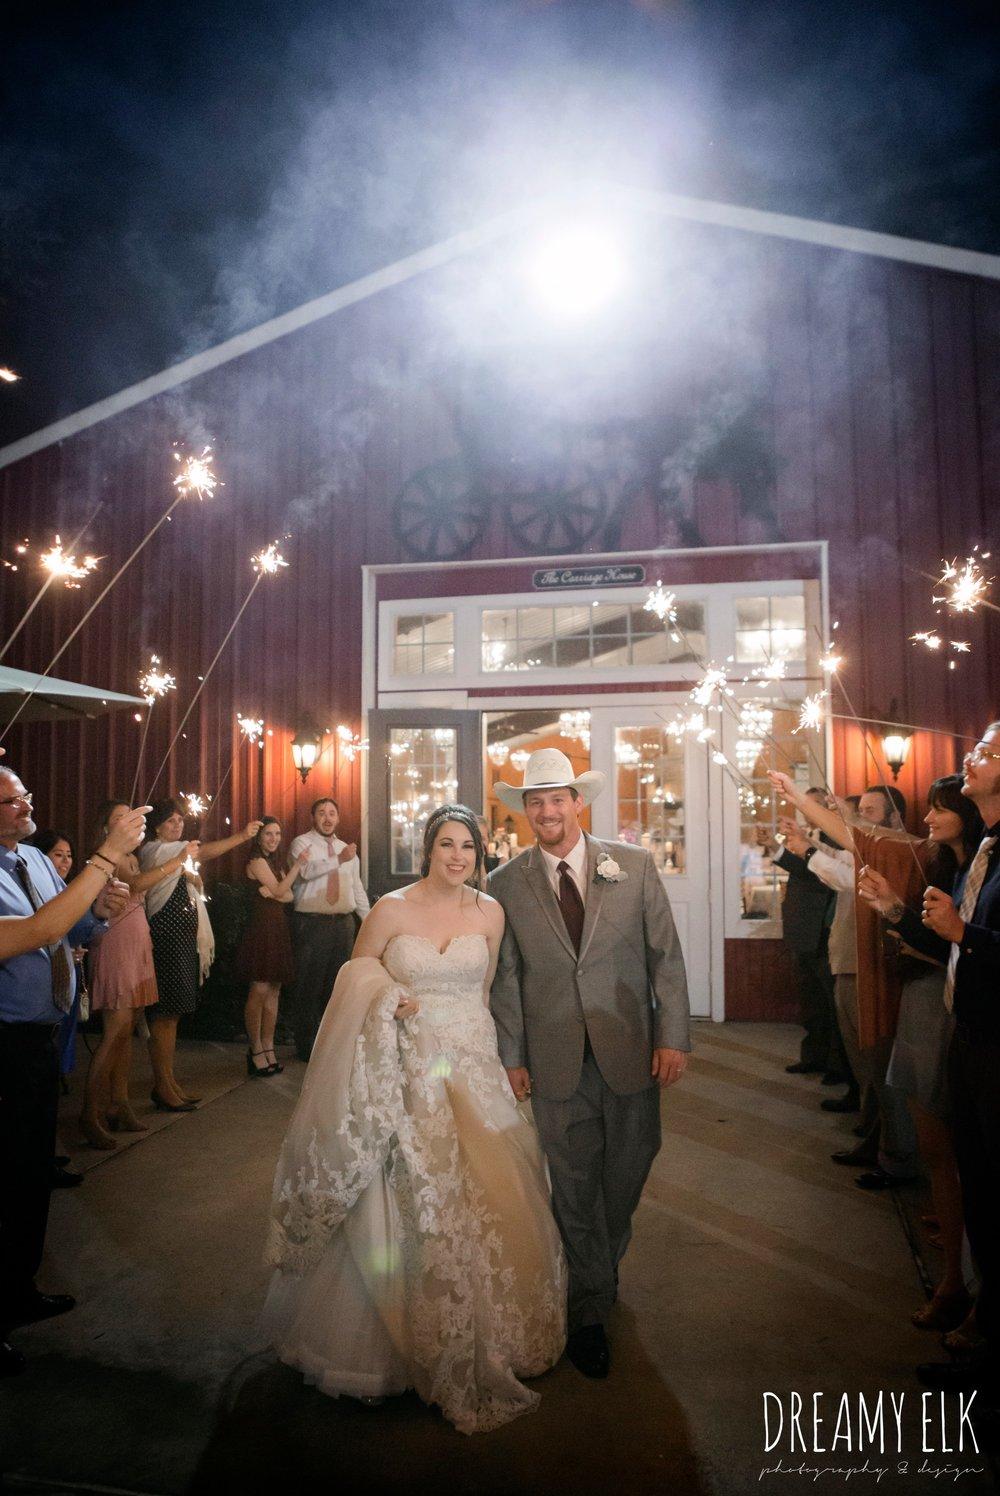 night send off with sparklers, september wedding photo, ashelynn manor, magnolia, texas, austin texas wedding photographer {dreamy elk photography and design}